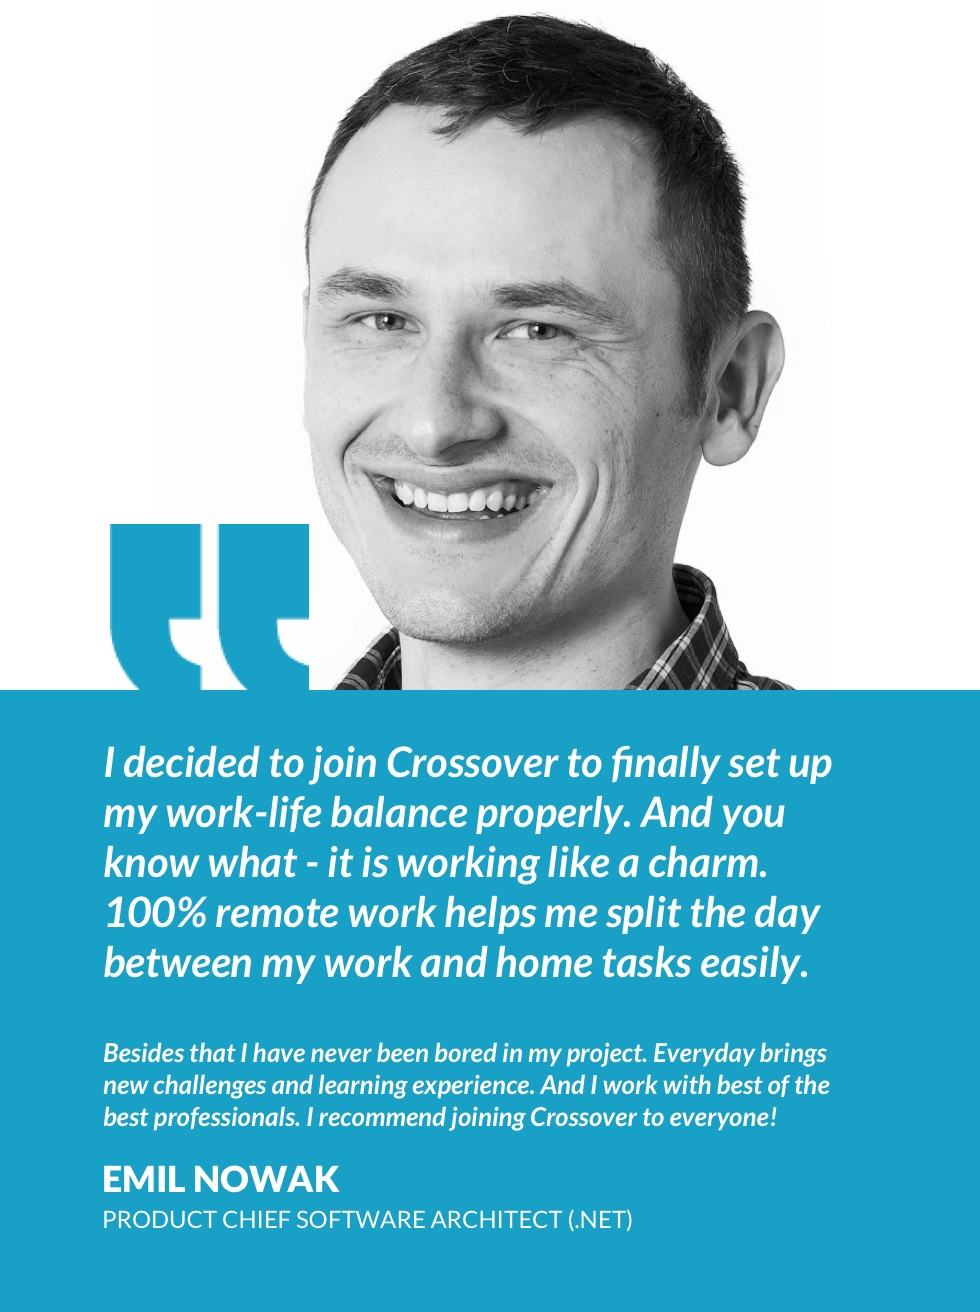 S_Product Chief Software Architect (.NET)_Emil Nowak_B.jpg